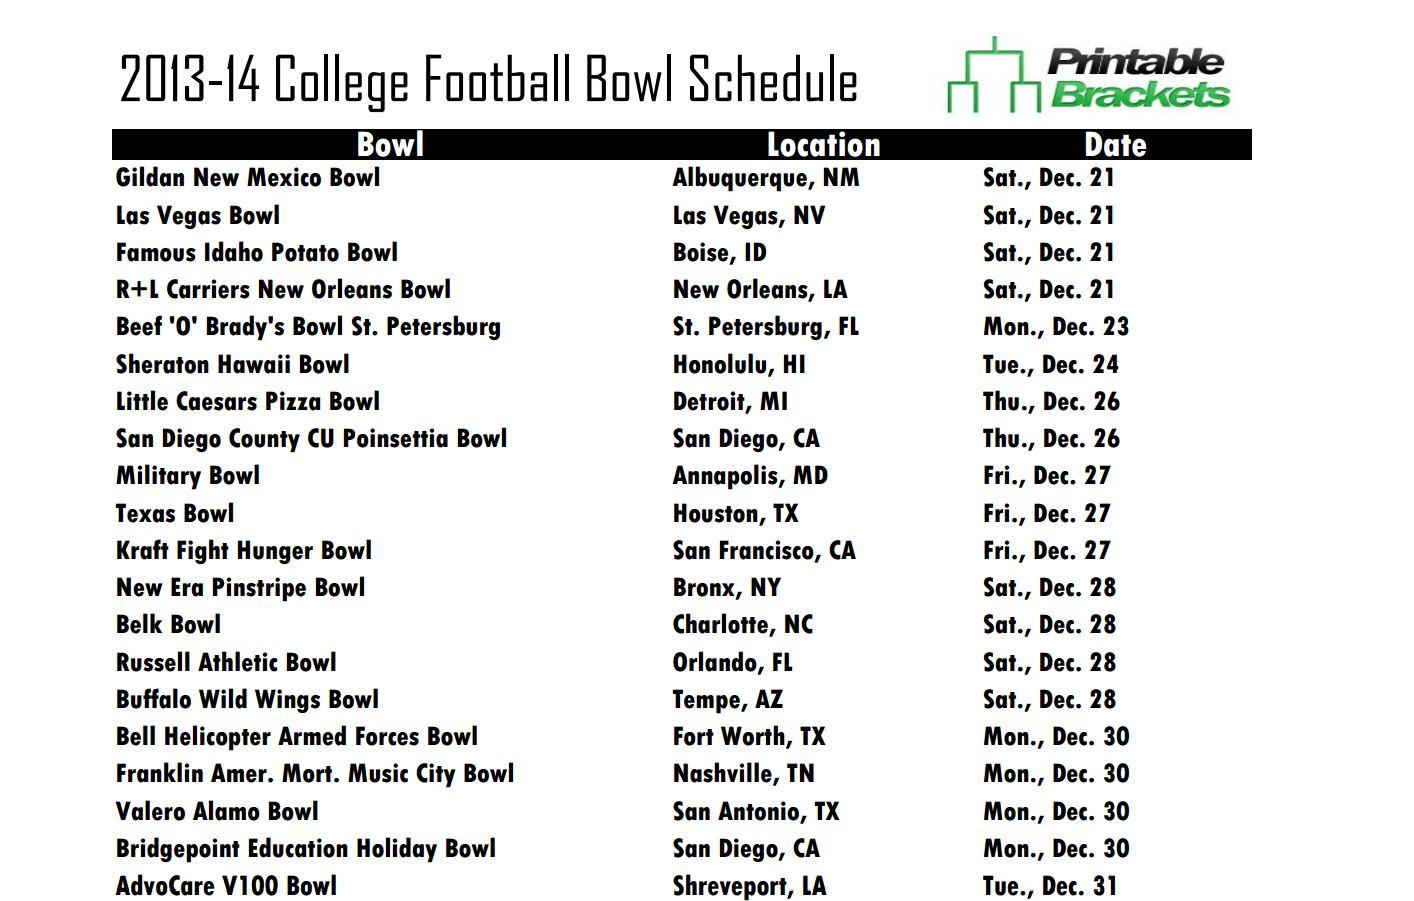 ncaa bowl game schedule collegefootballnews.com